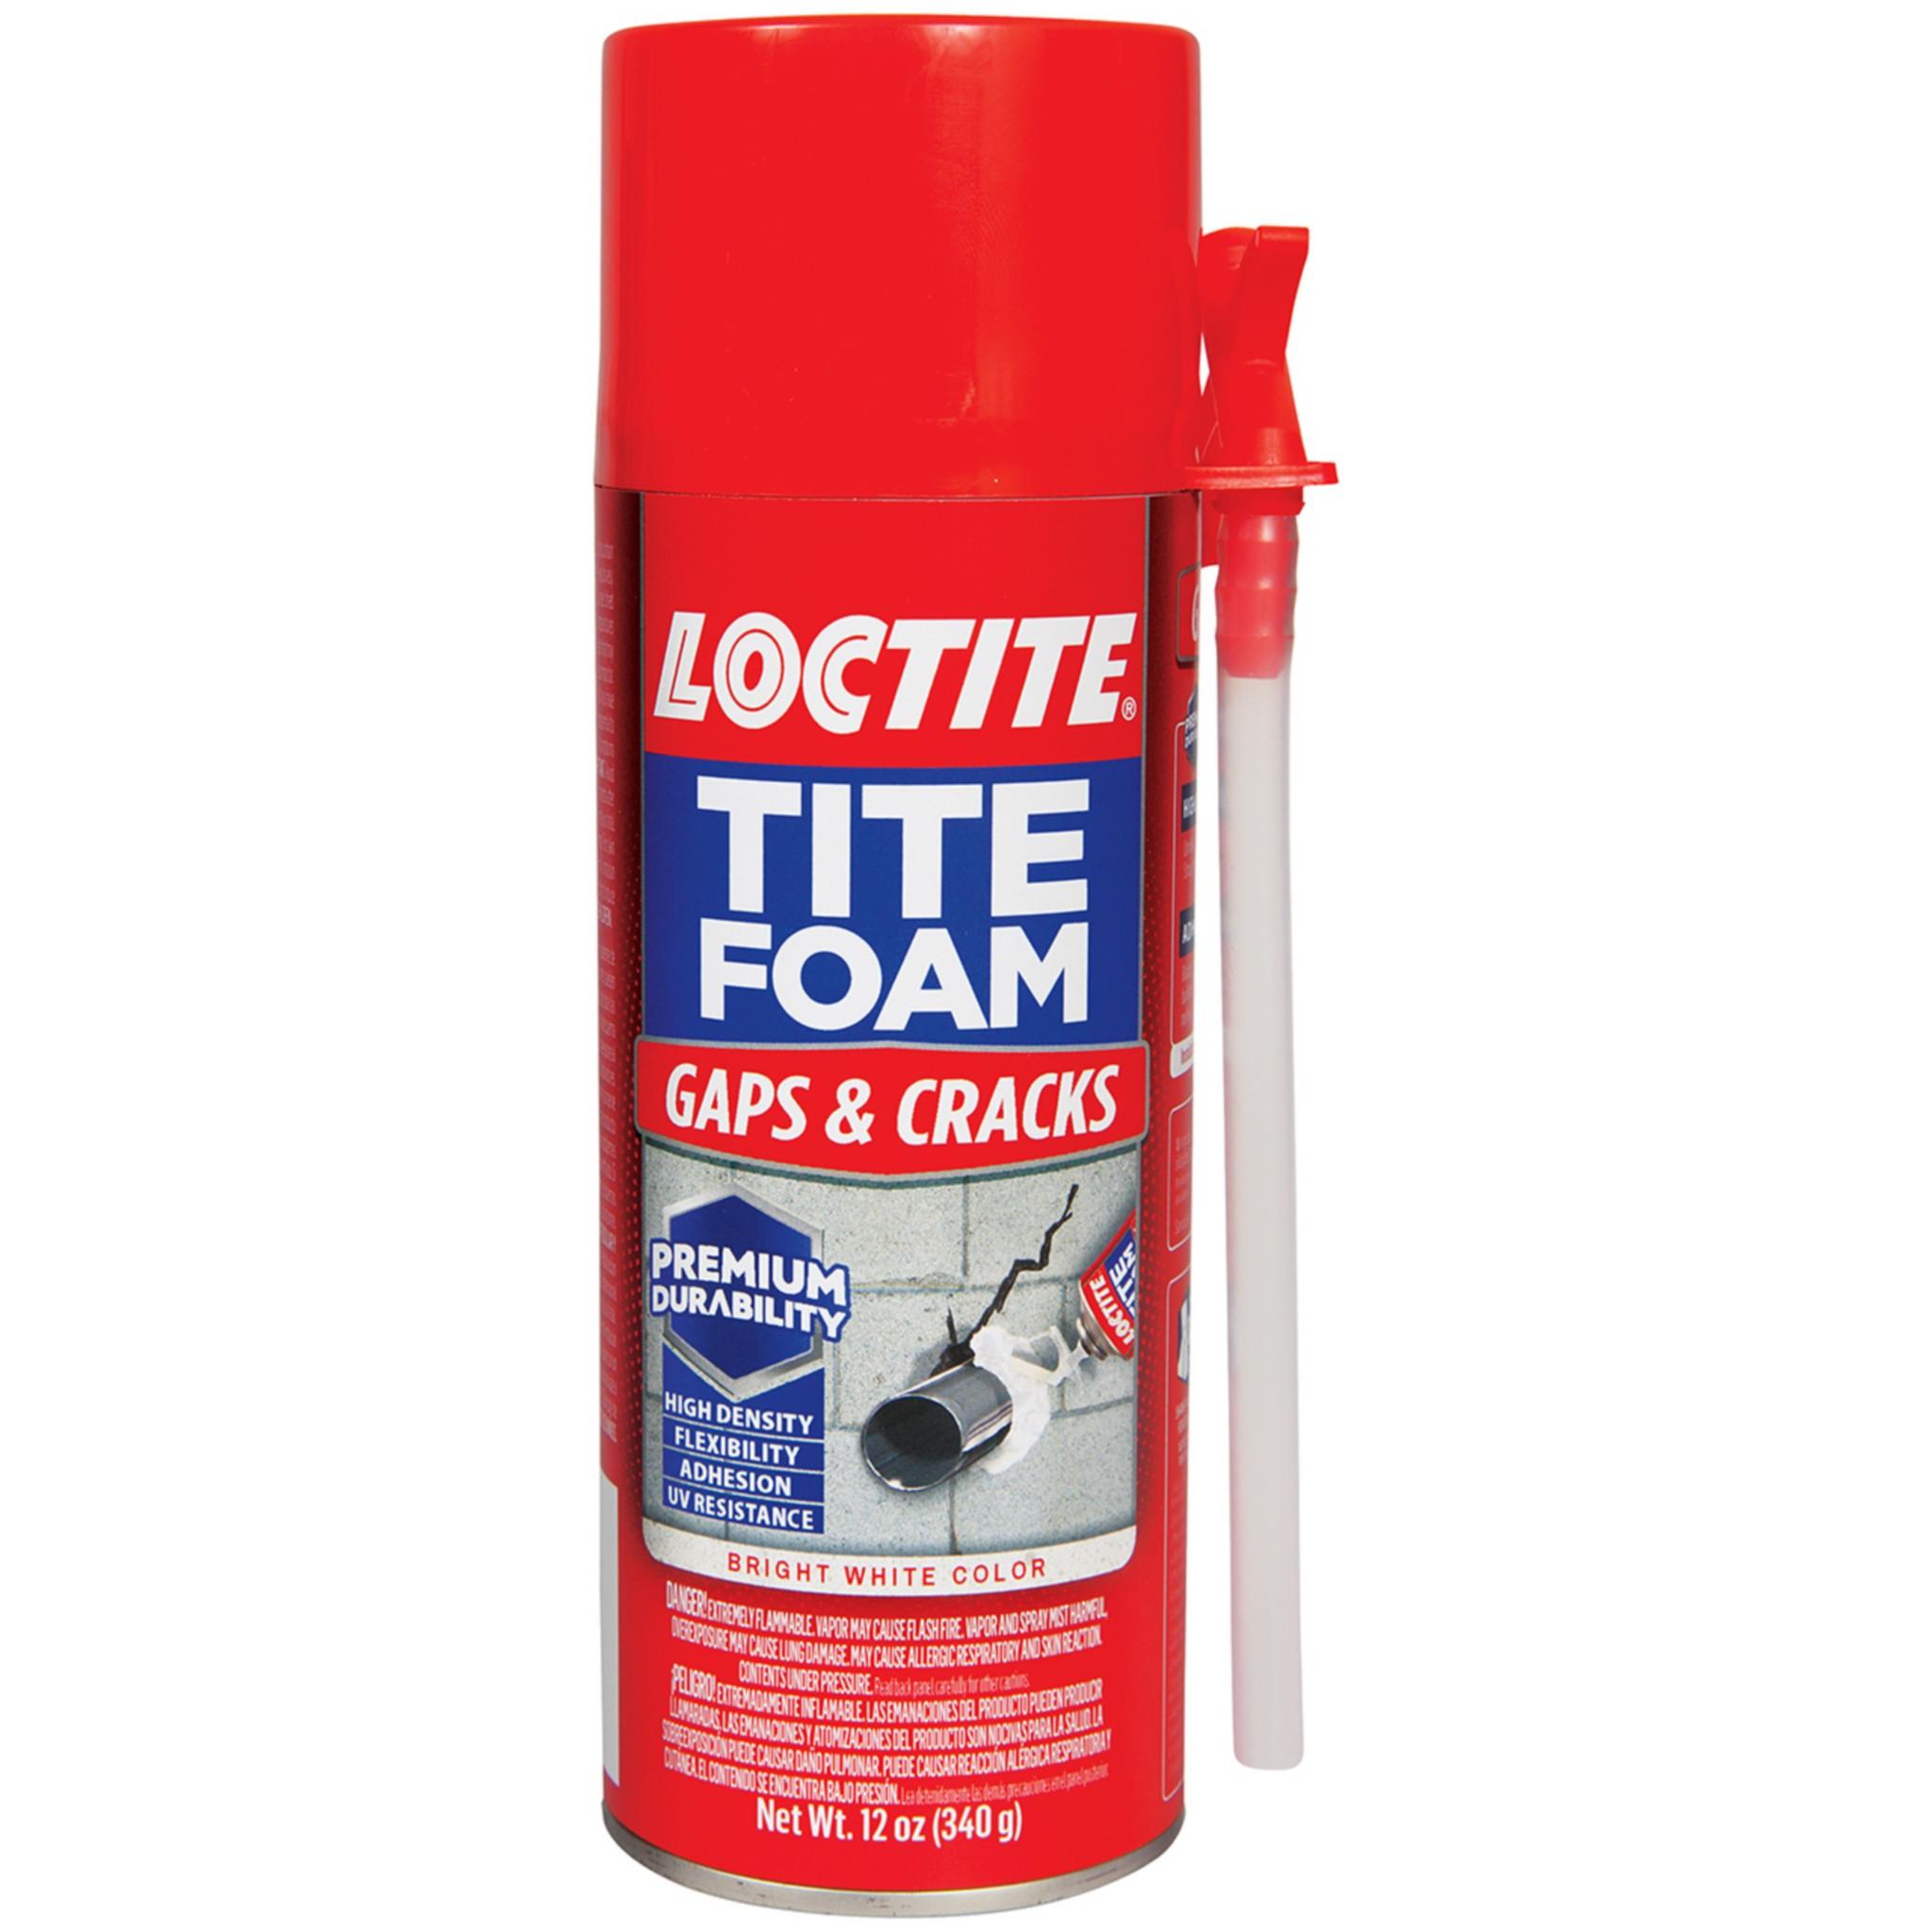 Tite Foam Gaps Cracks Insulating Foam Sealant